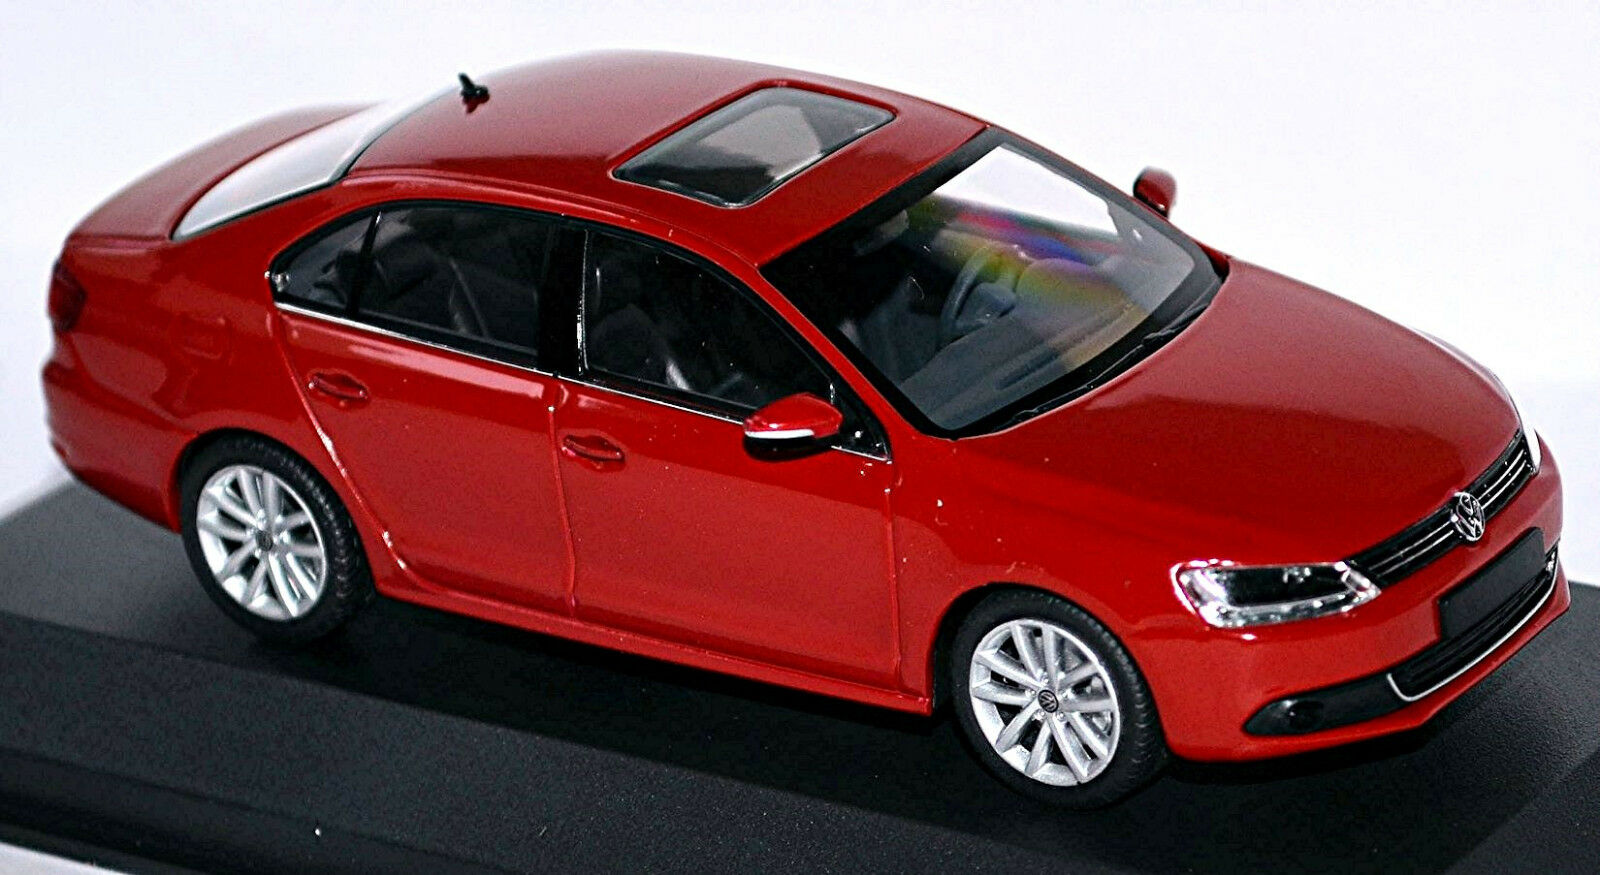 VW Volkswagen Jetta VI 2010-14 rot rot 1 43 Minichamps  | Outlet Store Online